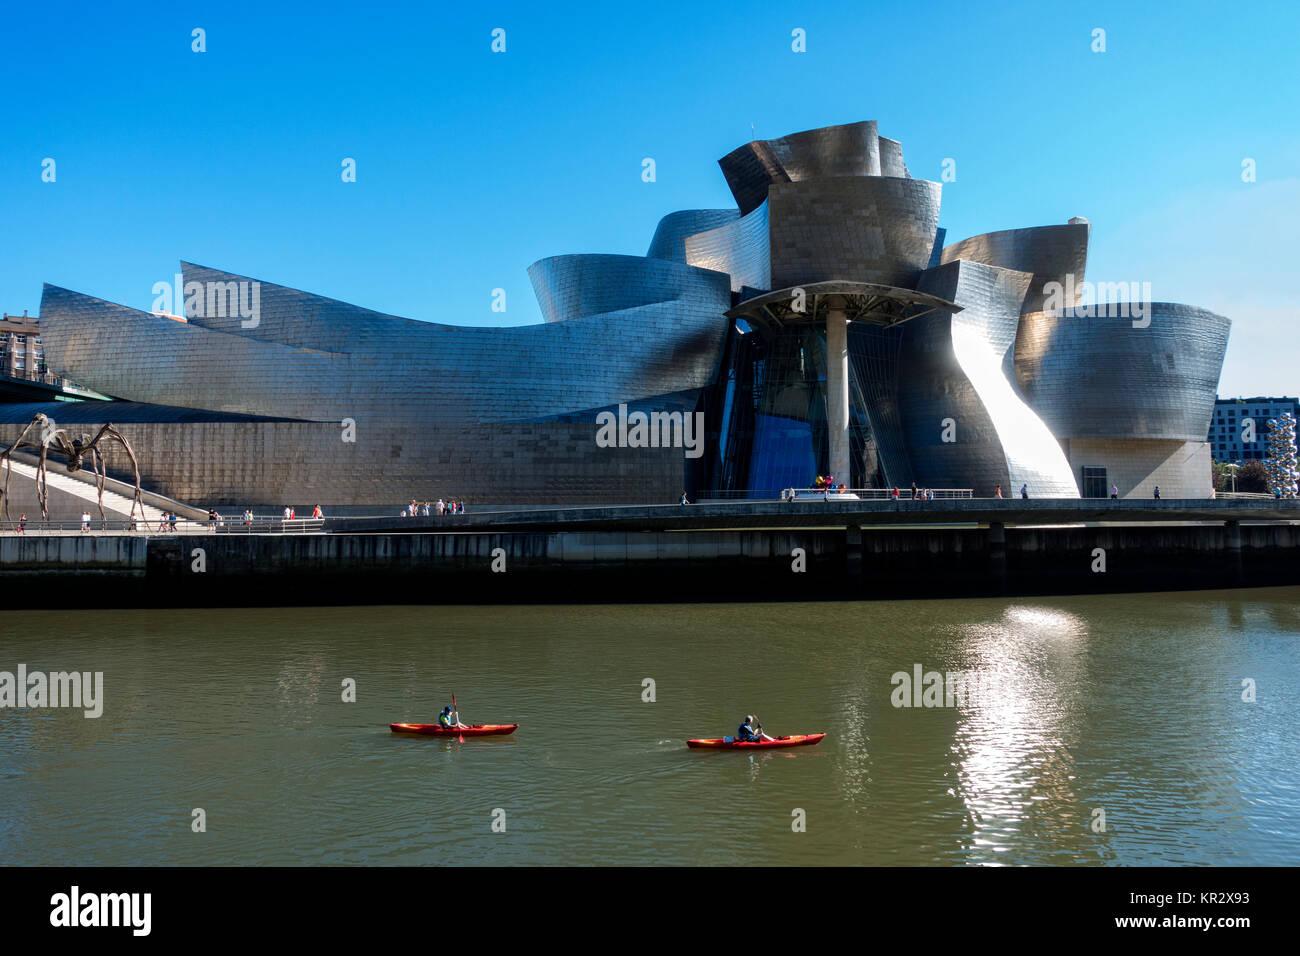 Guggenheim Museum Bilbao.Spain.Architect:Frank Gehry - Stock Image